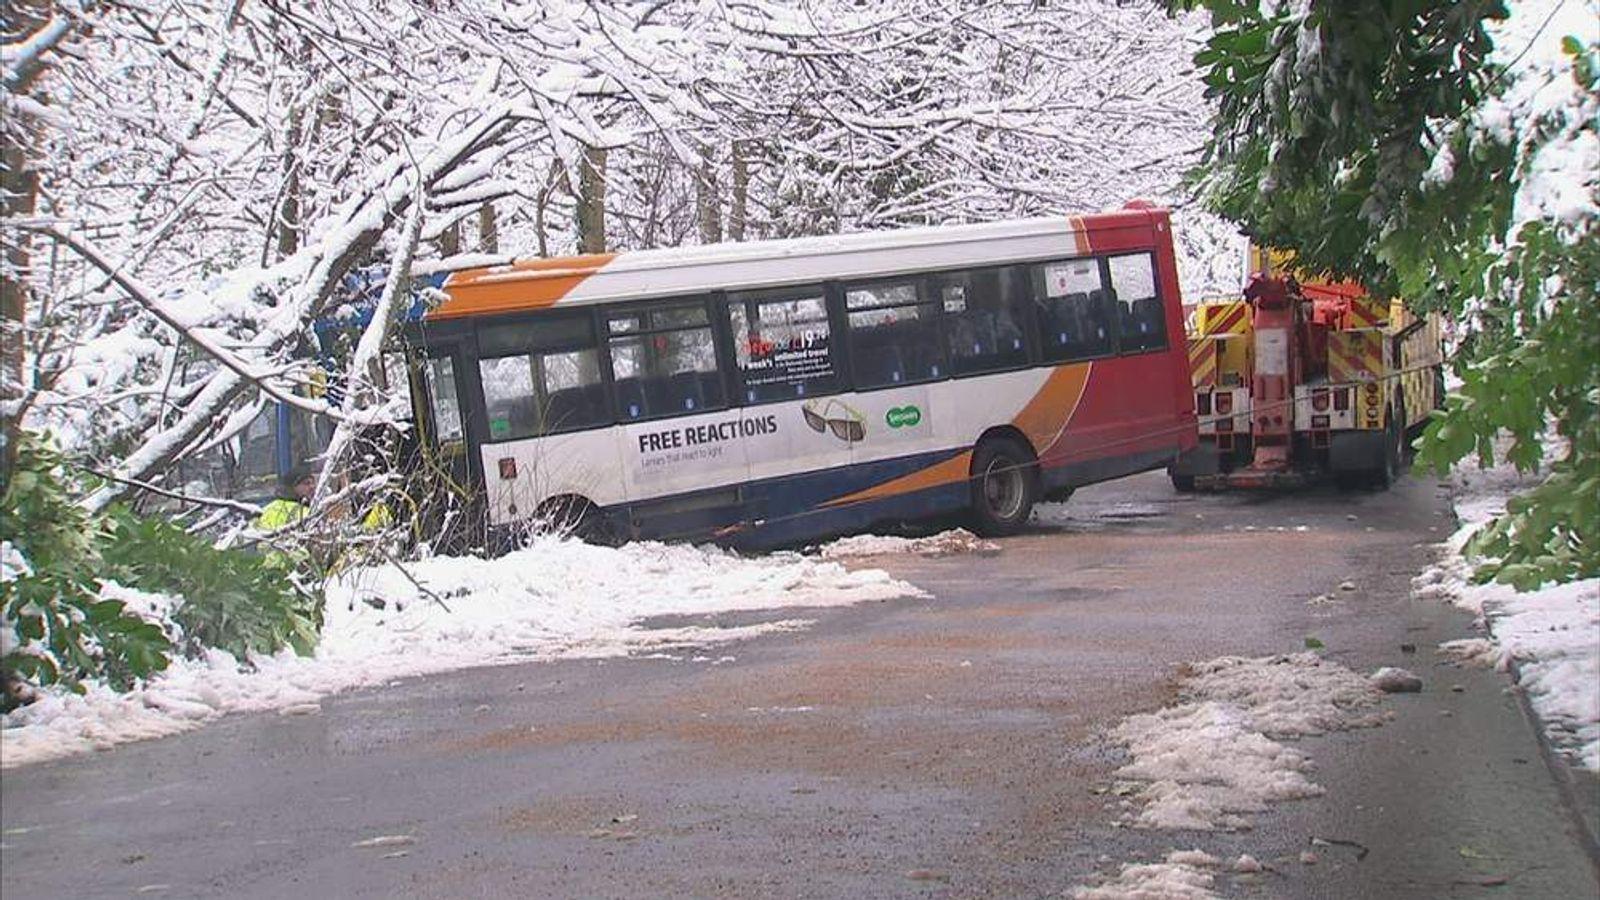 Caerphilly bus crash